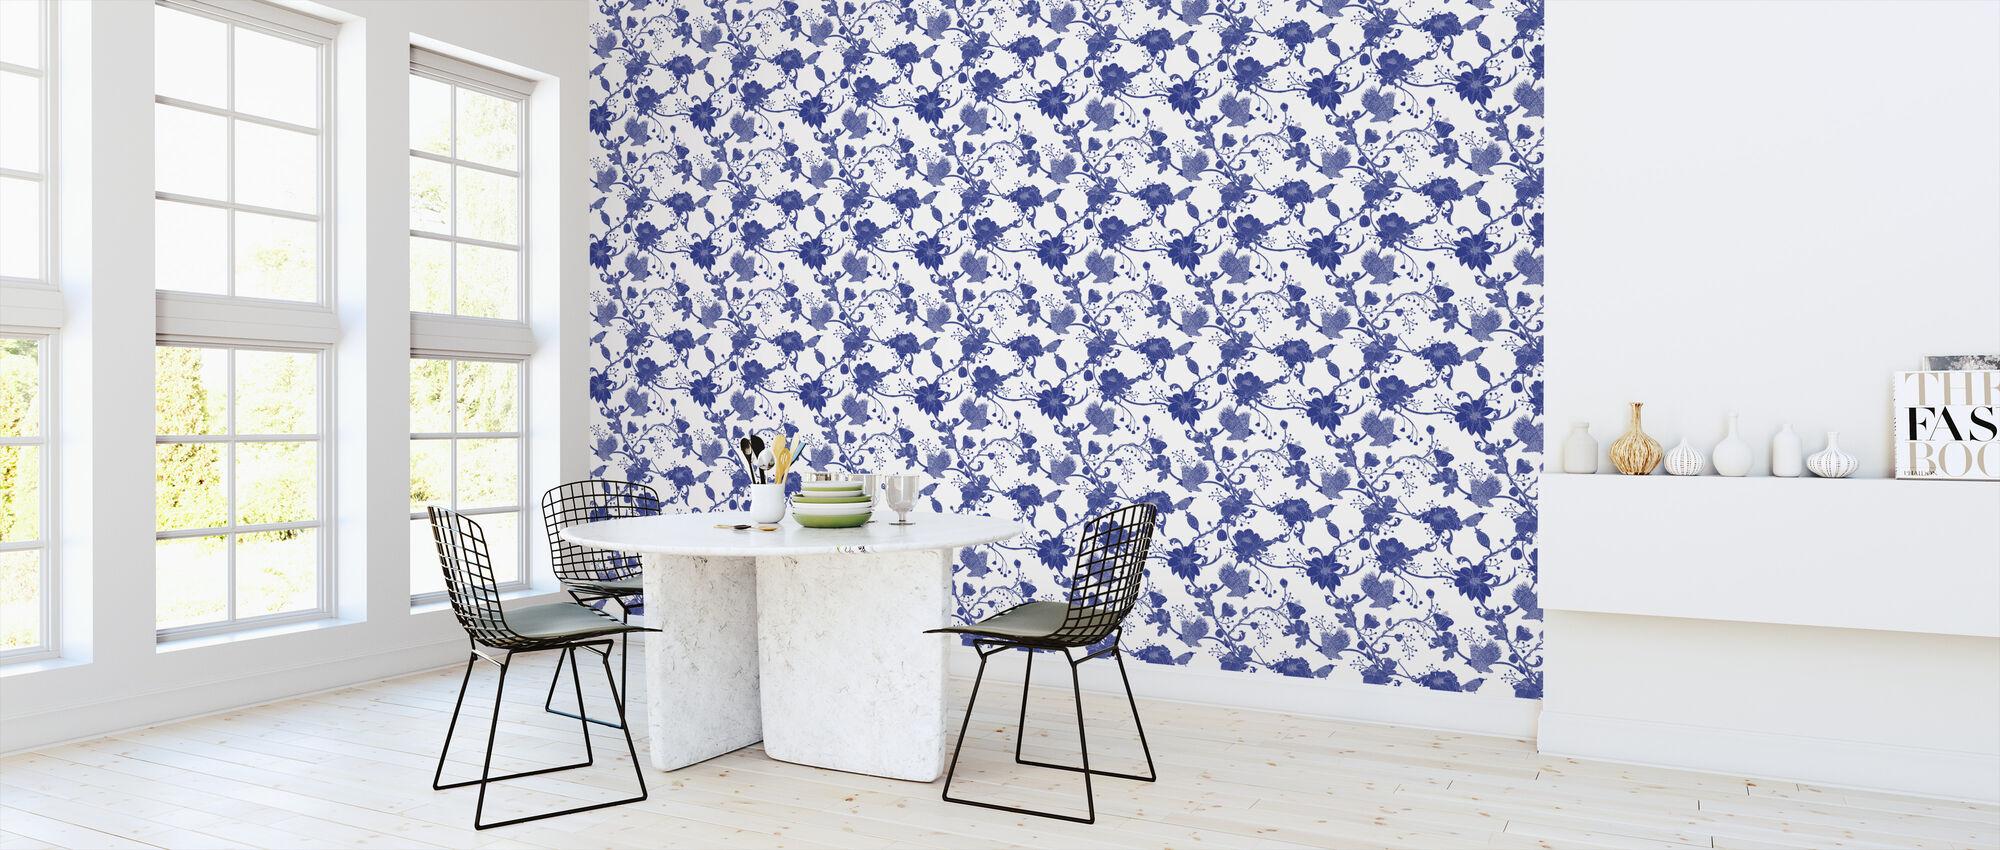 Botanica - Blue - Wallpaper - Kitchen